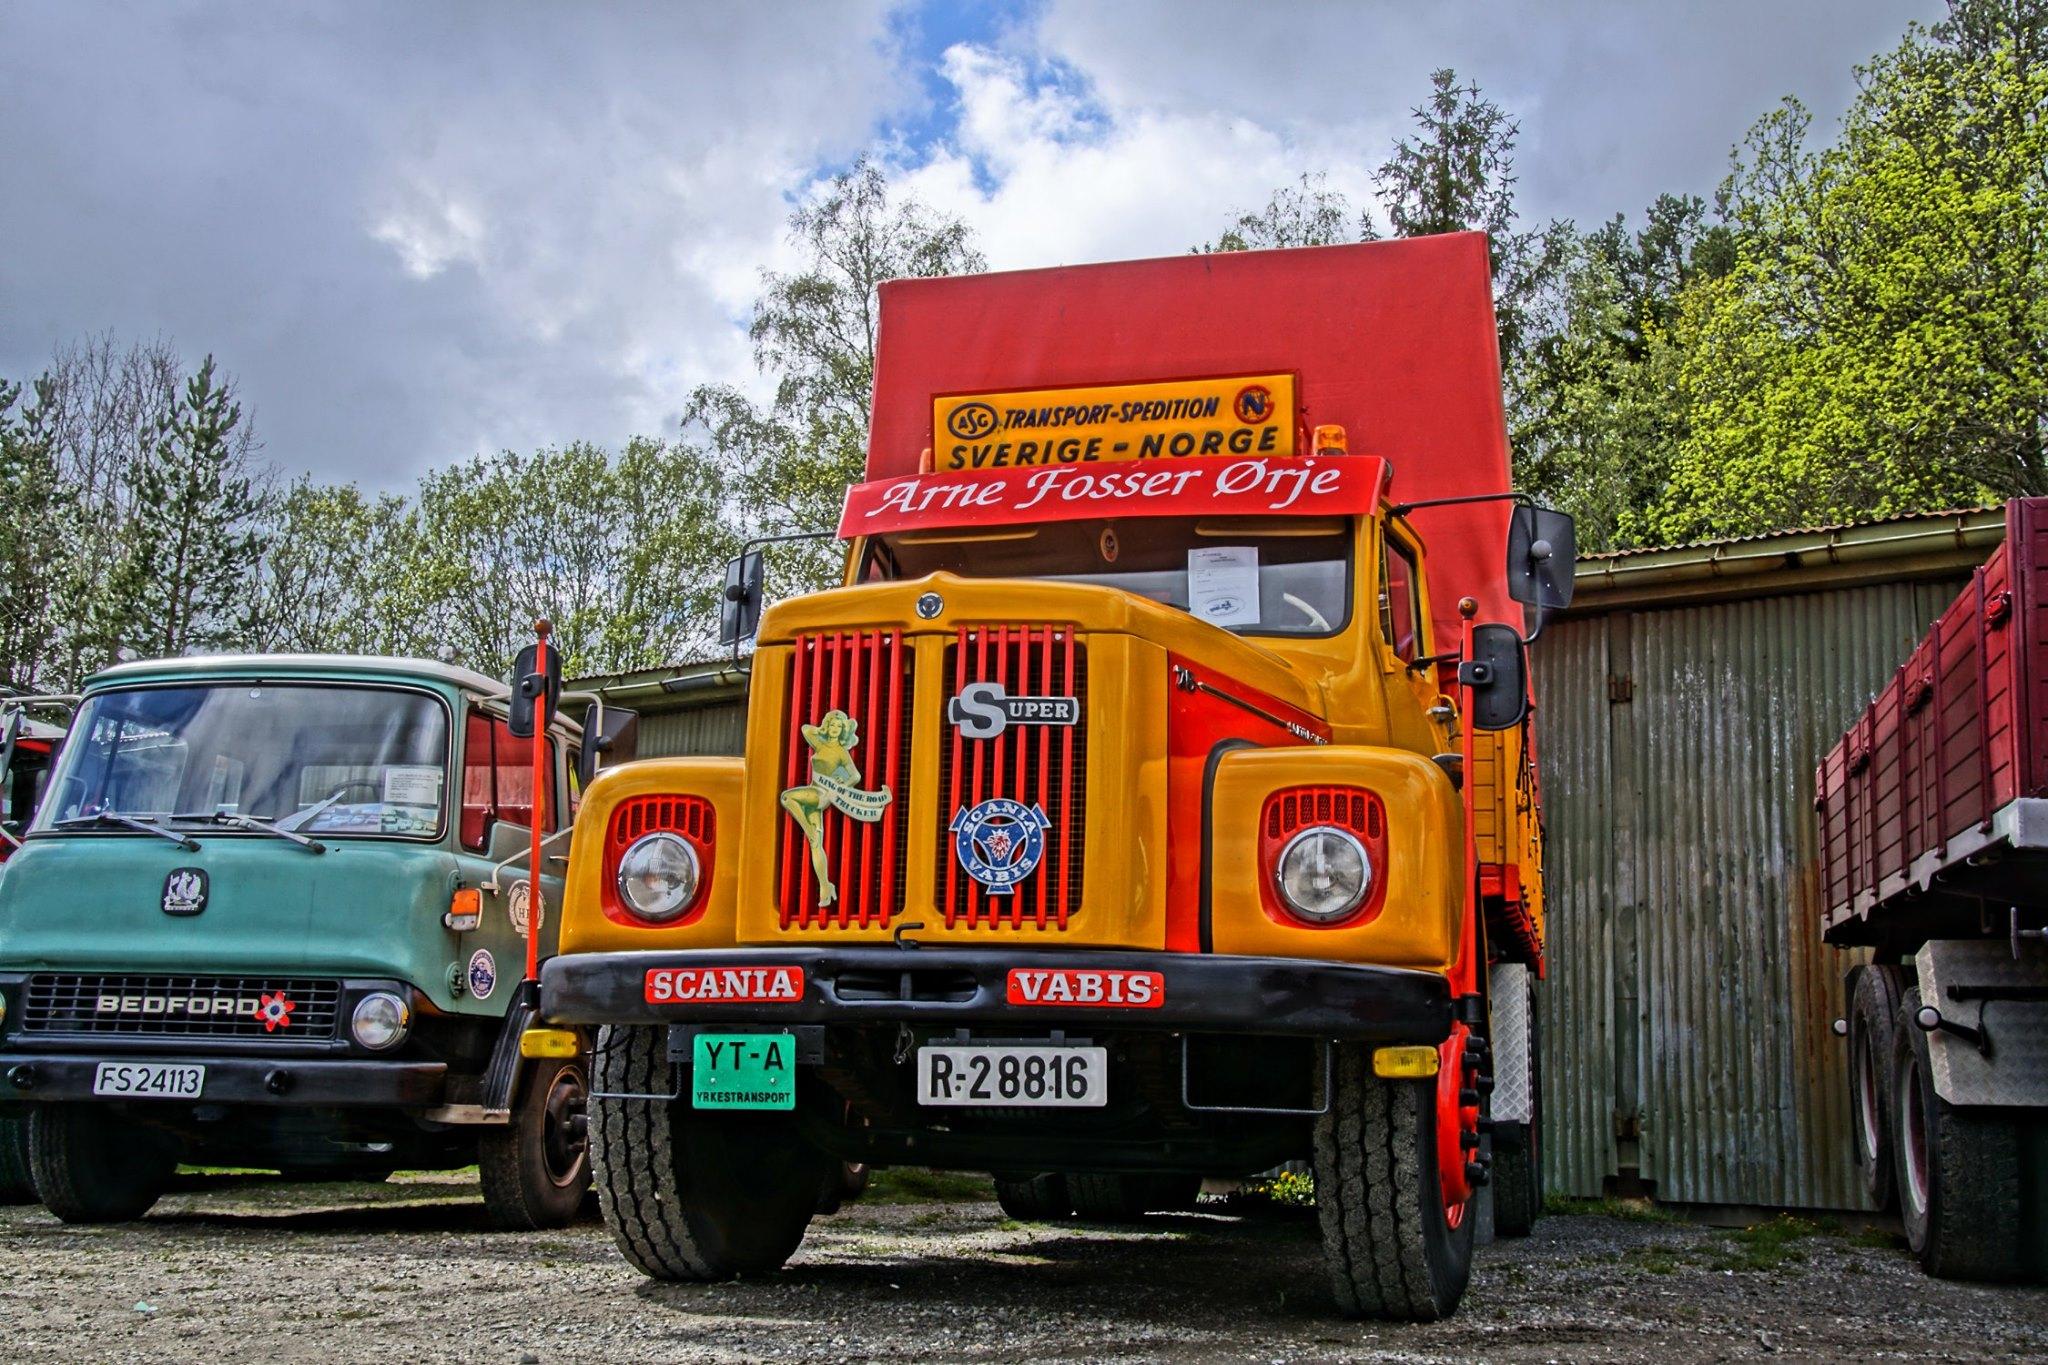 Bedford--Scania-Vabis--